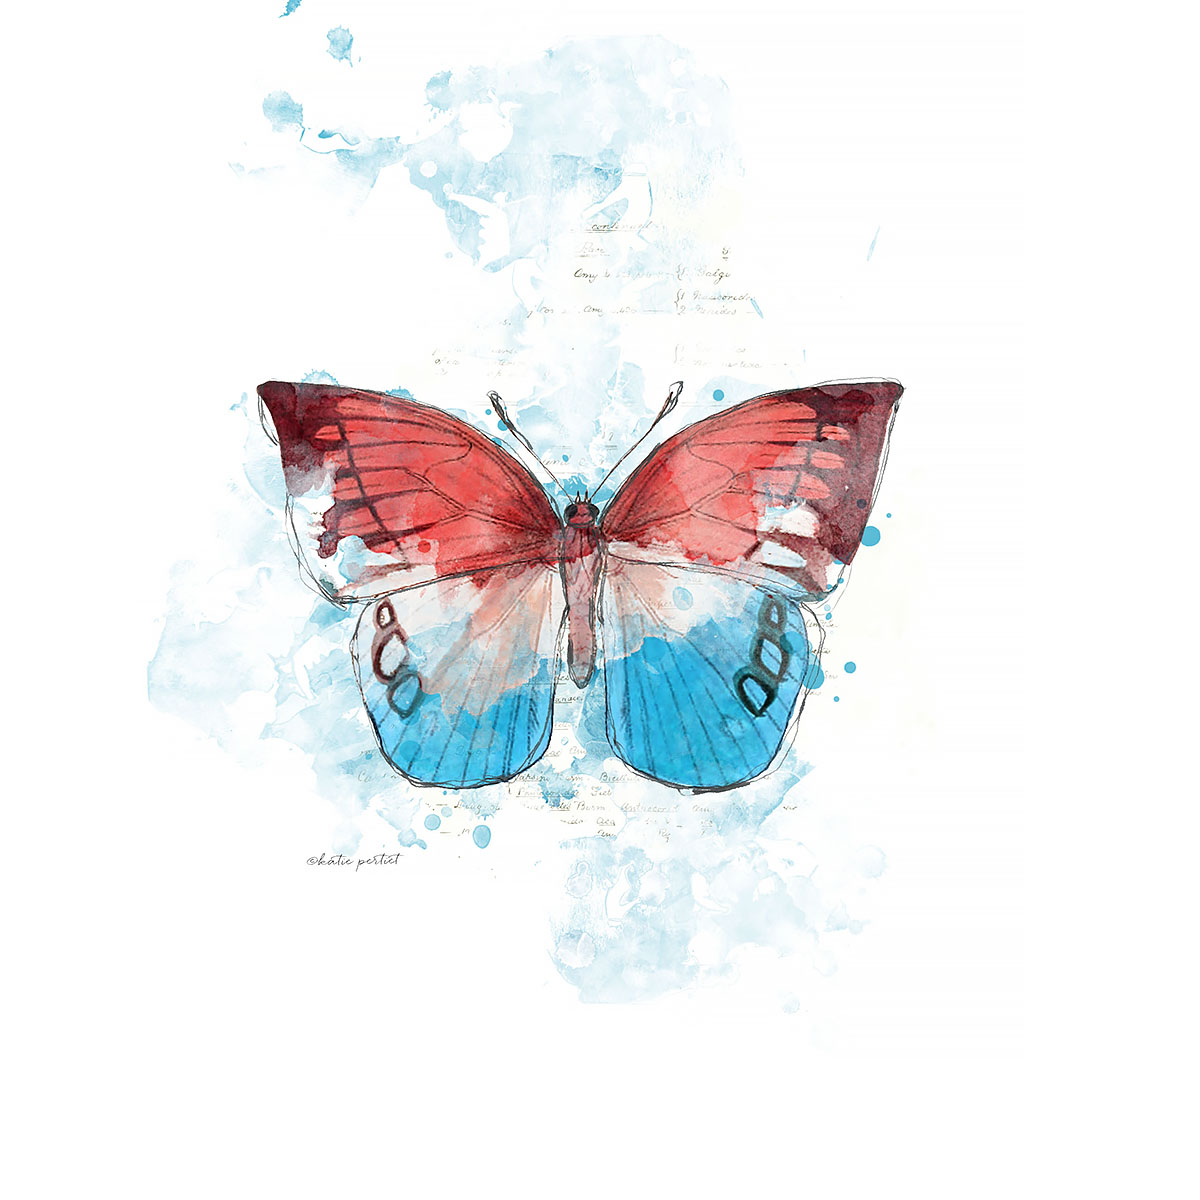 Katie Pertiet Painted Patriotic Butterfly